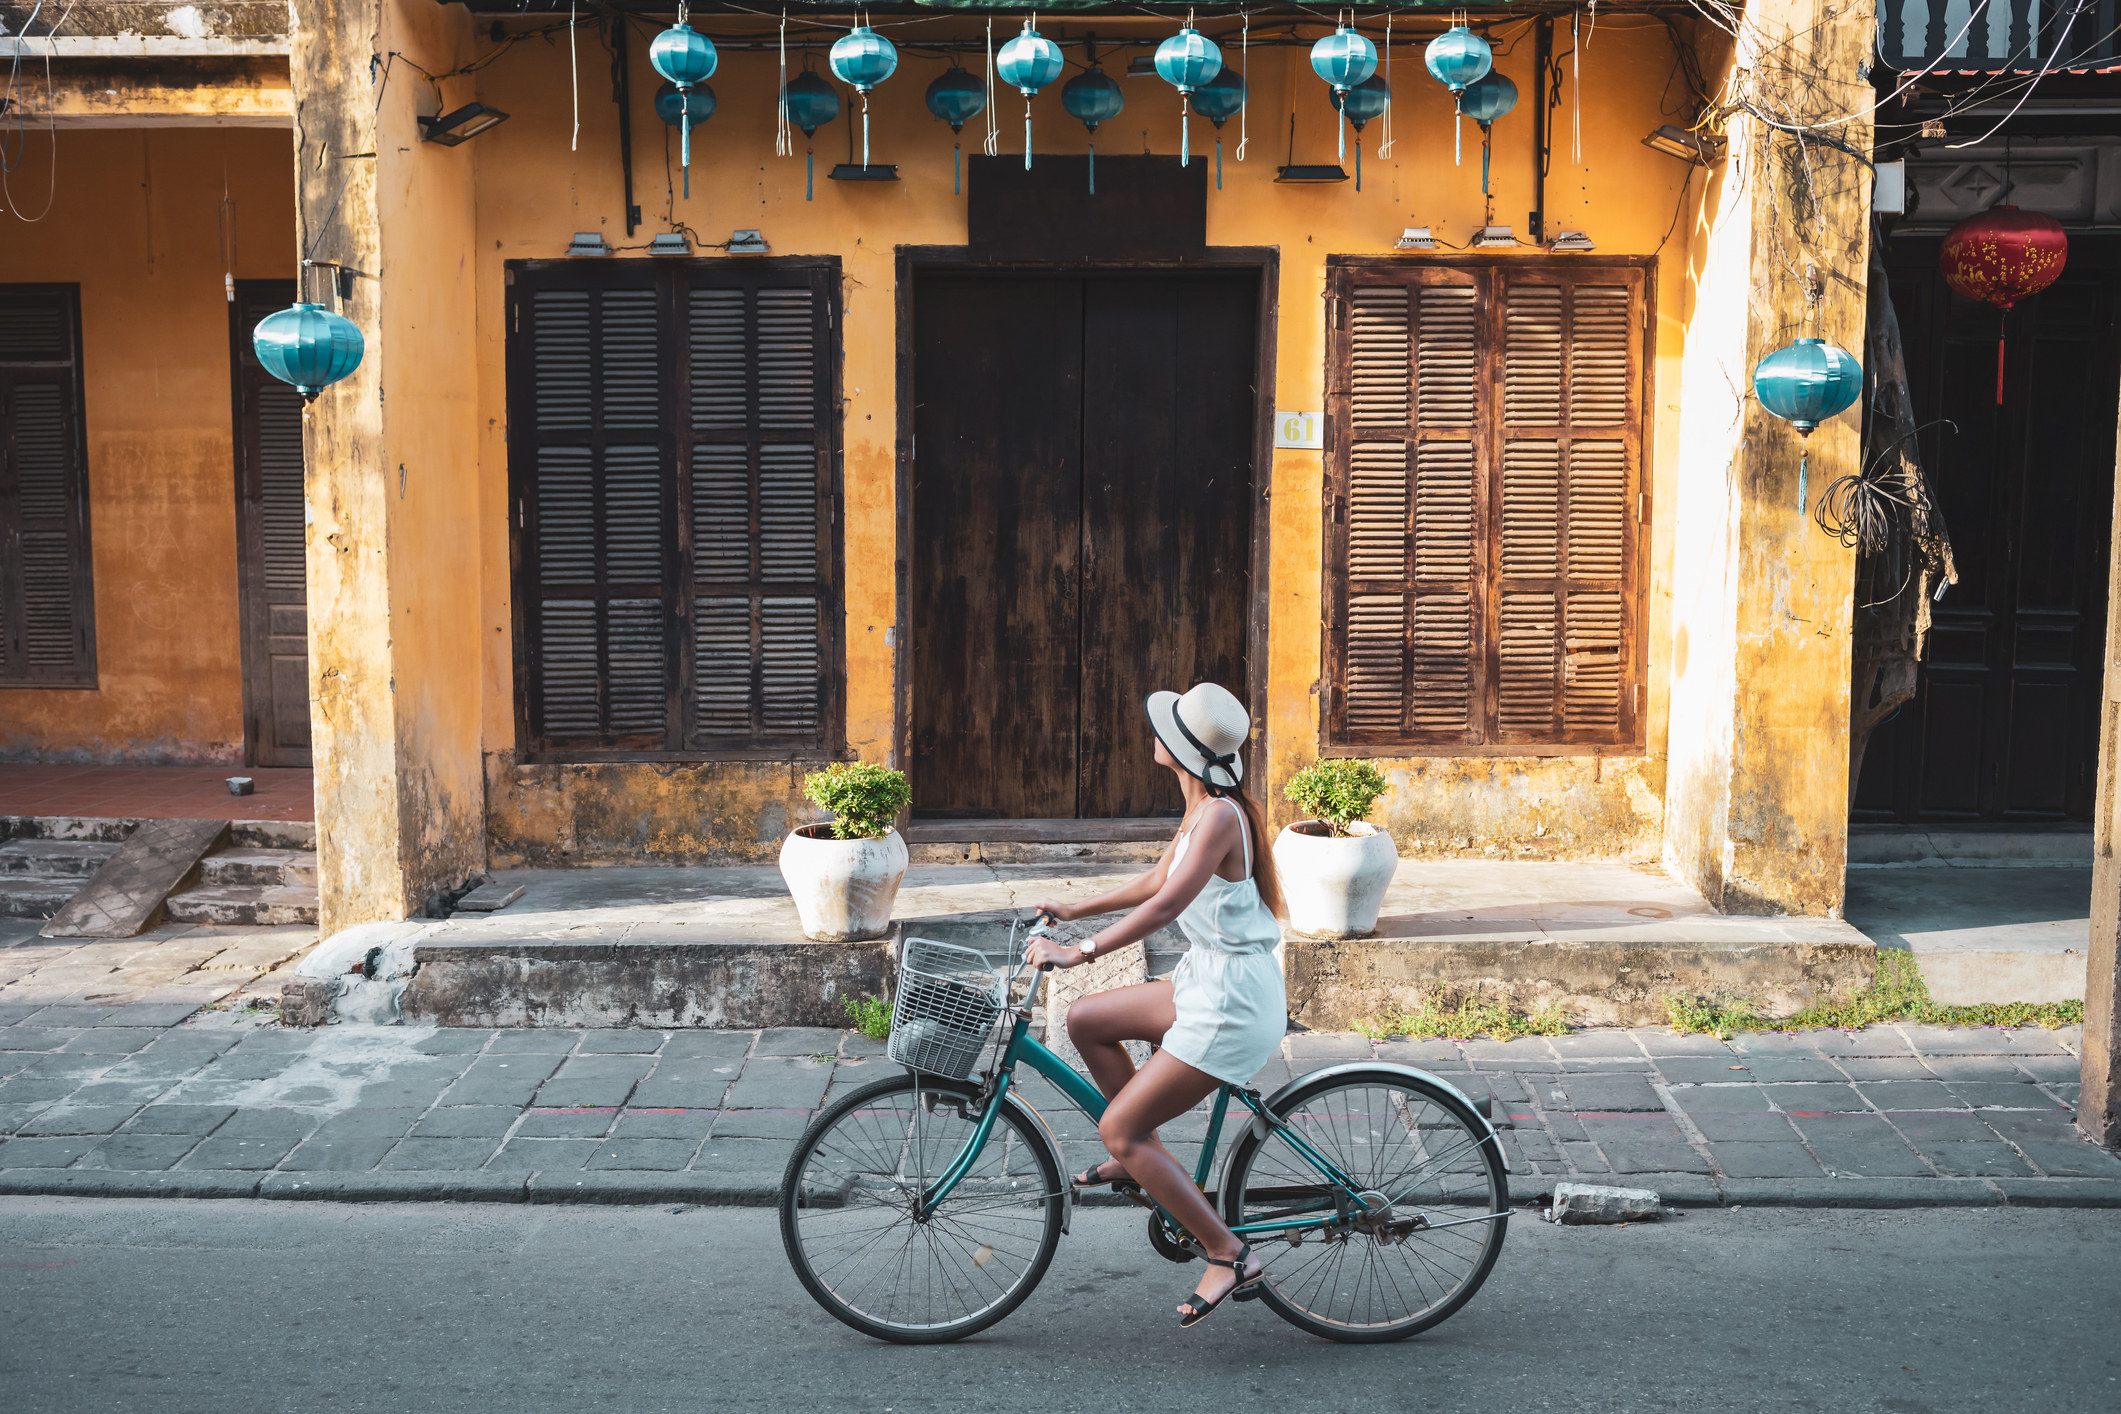 A woman bike riding in an Asian city